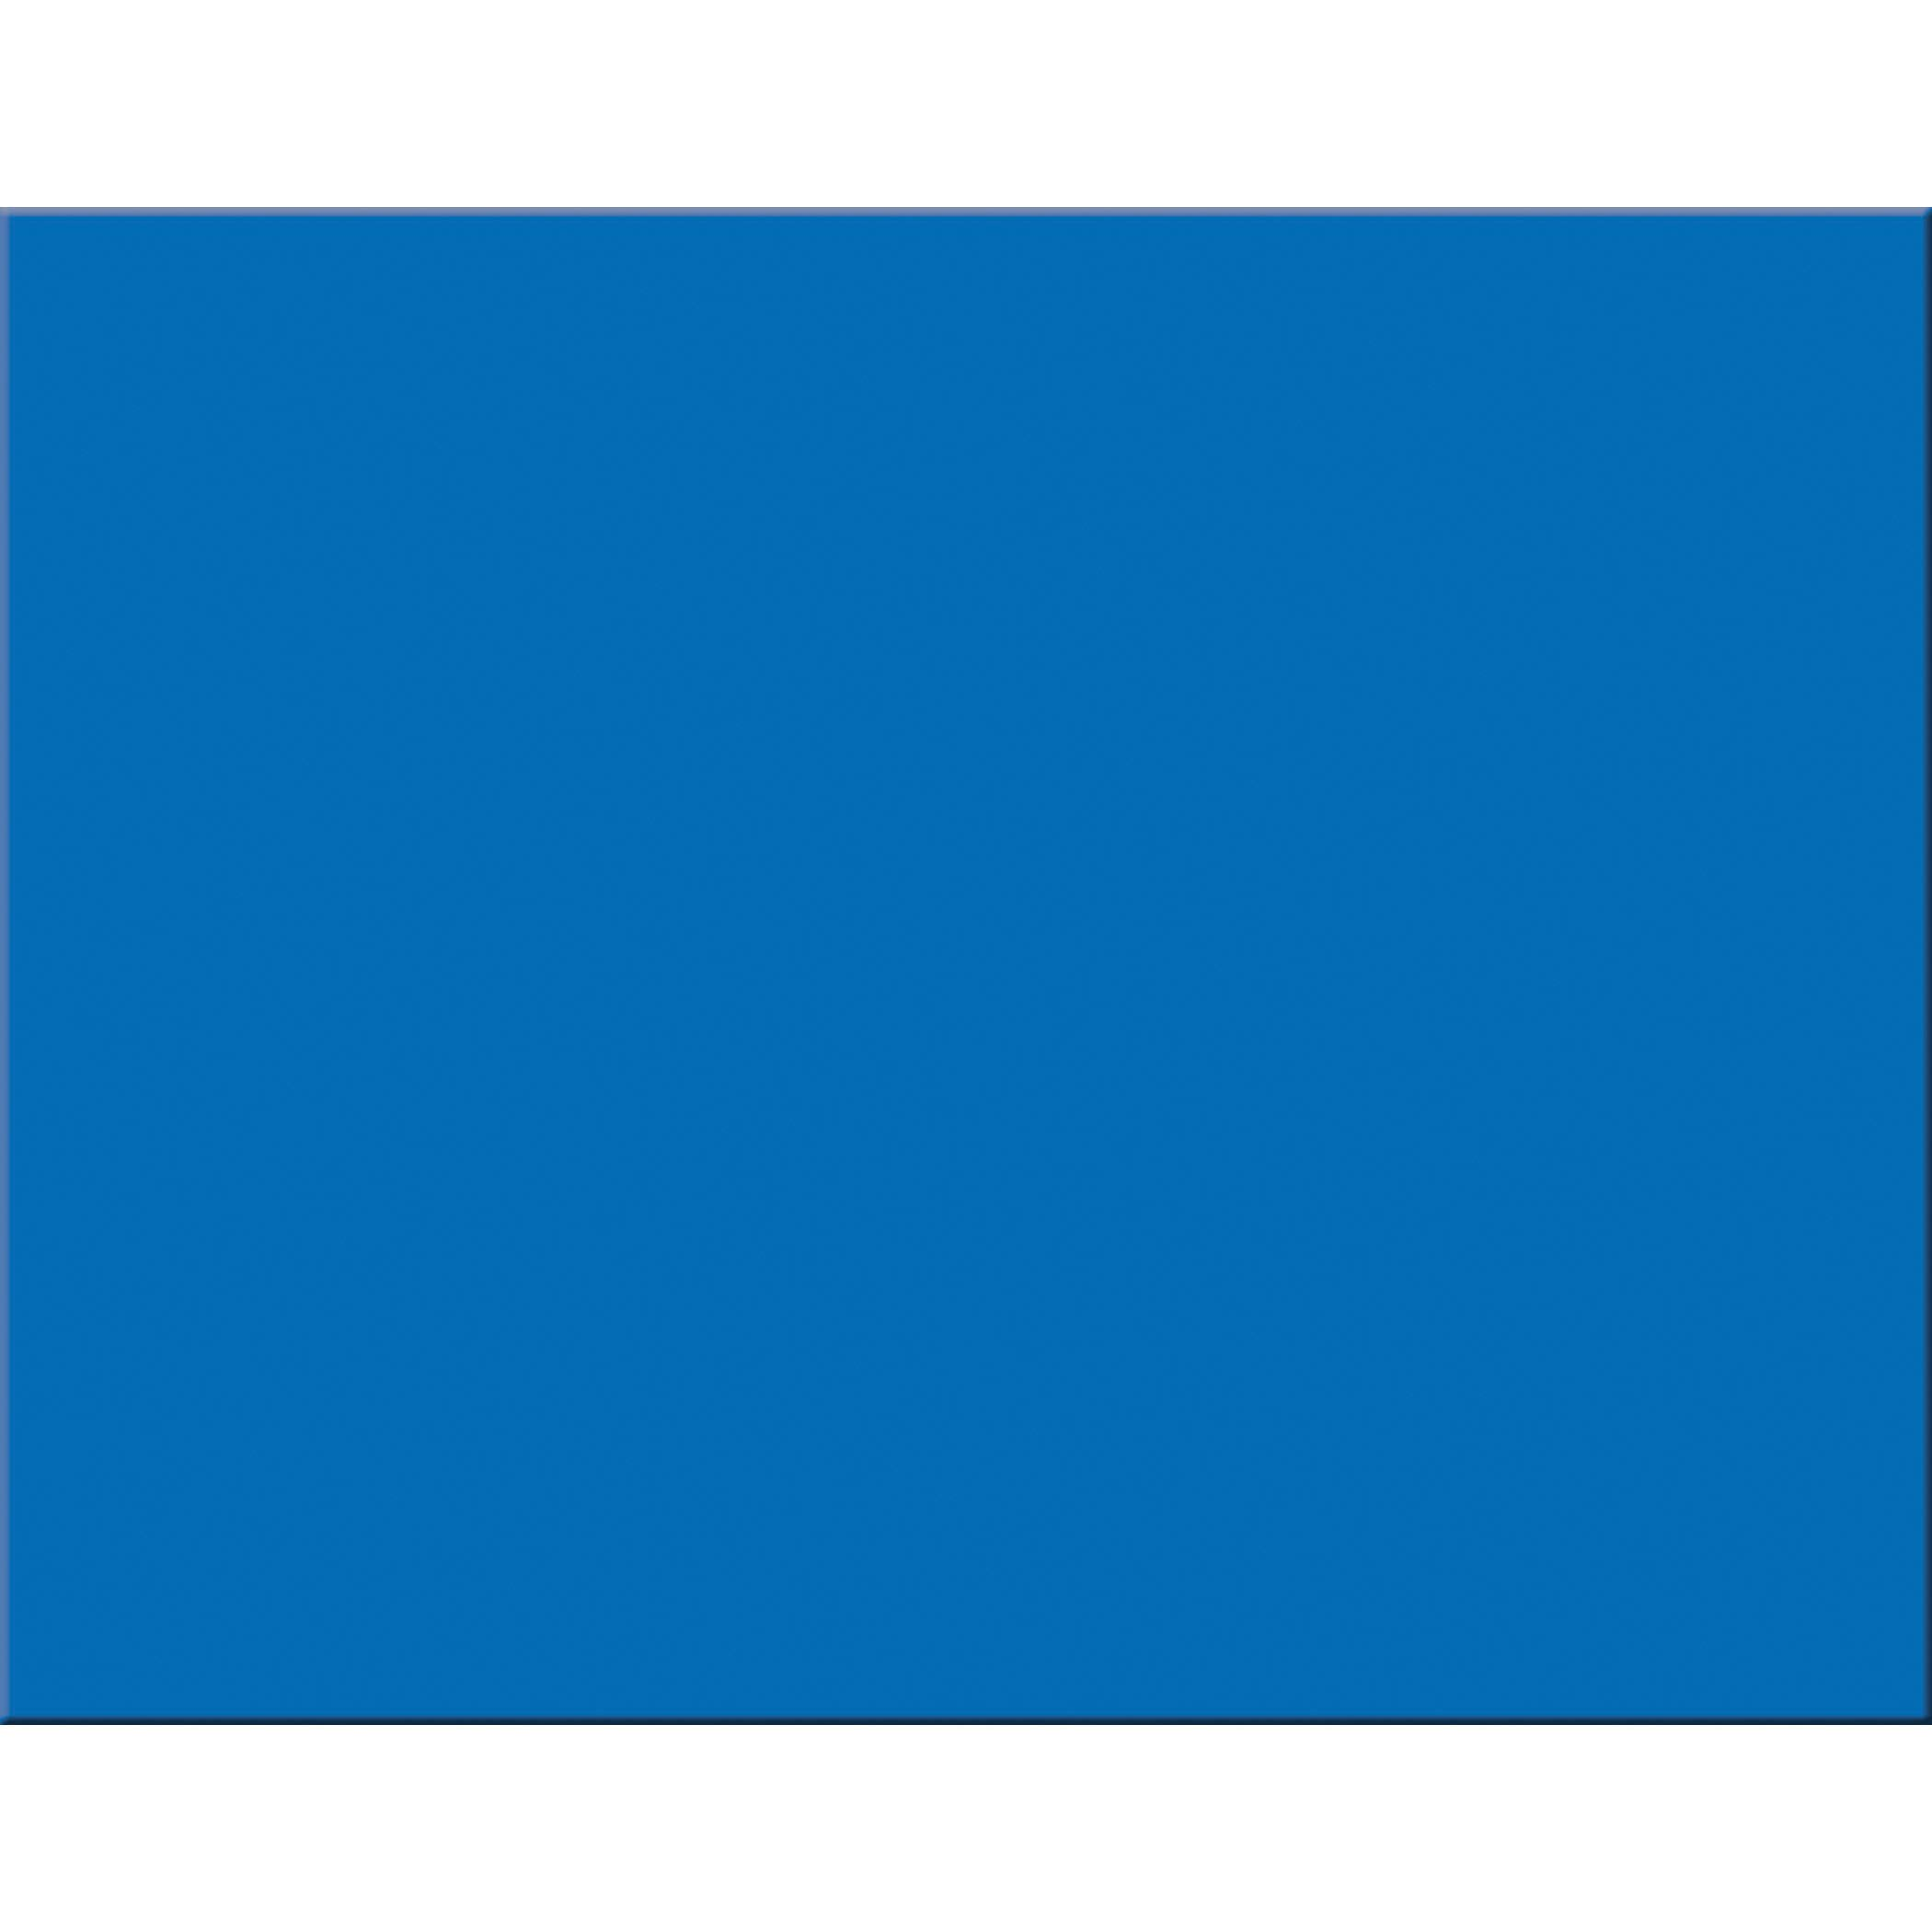 Pacon PAC54621 6-Ply Railroad Board, Dark Blue, 22'' x 28'', 25 Sheets